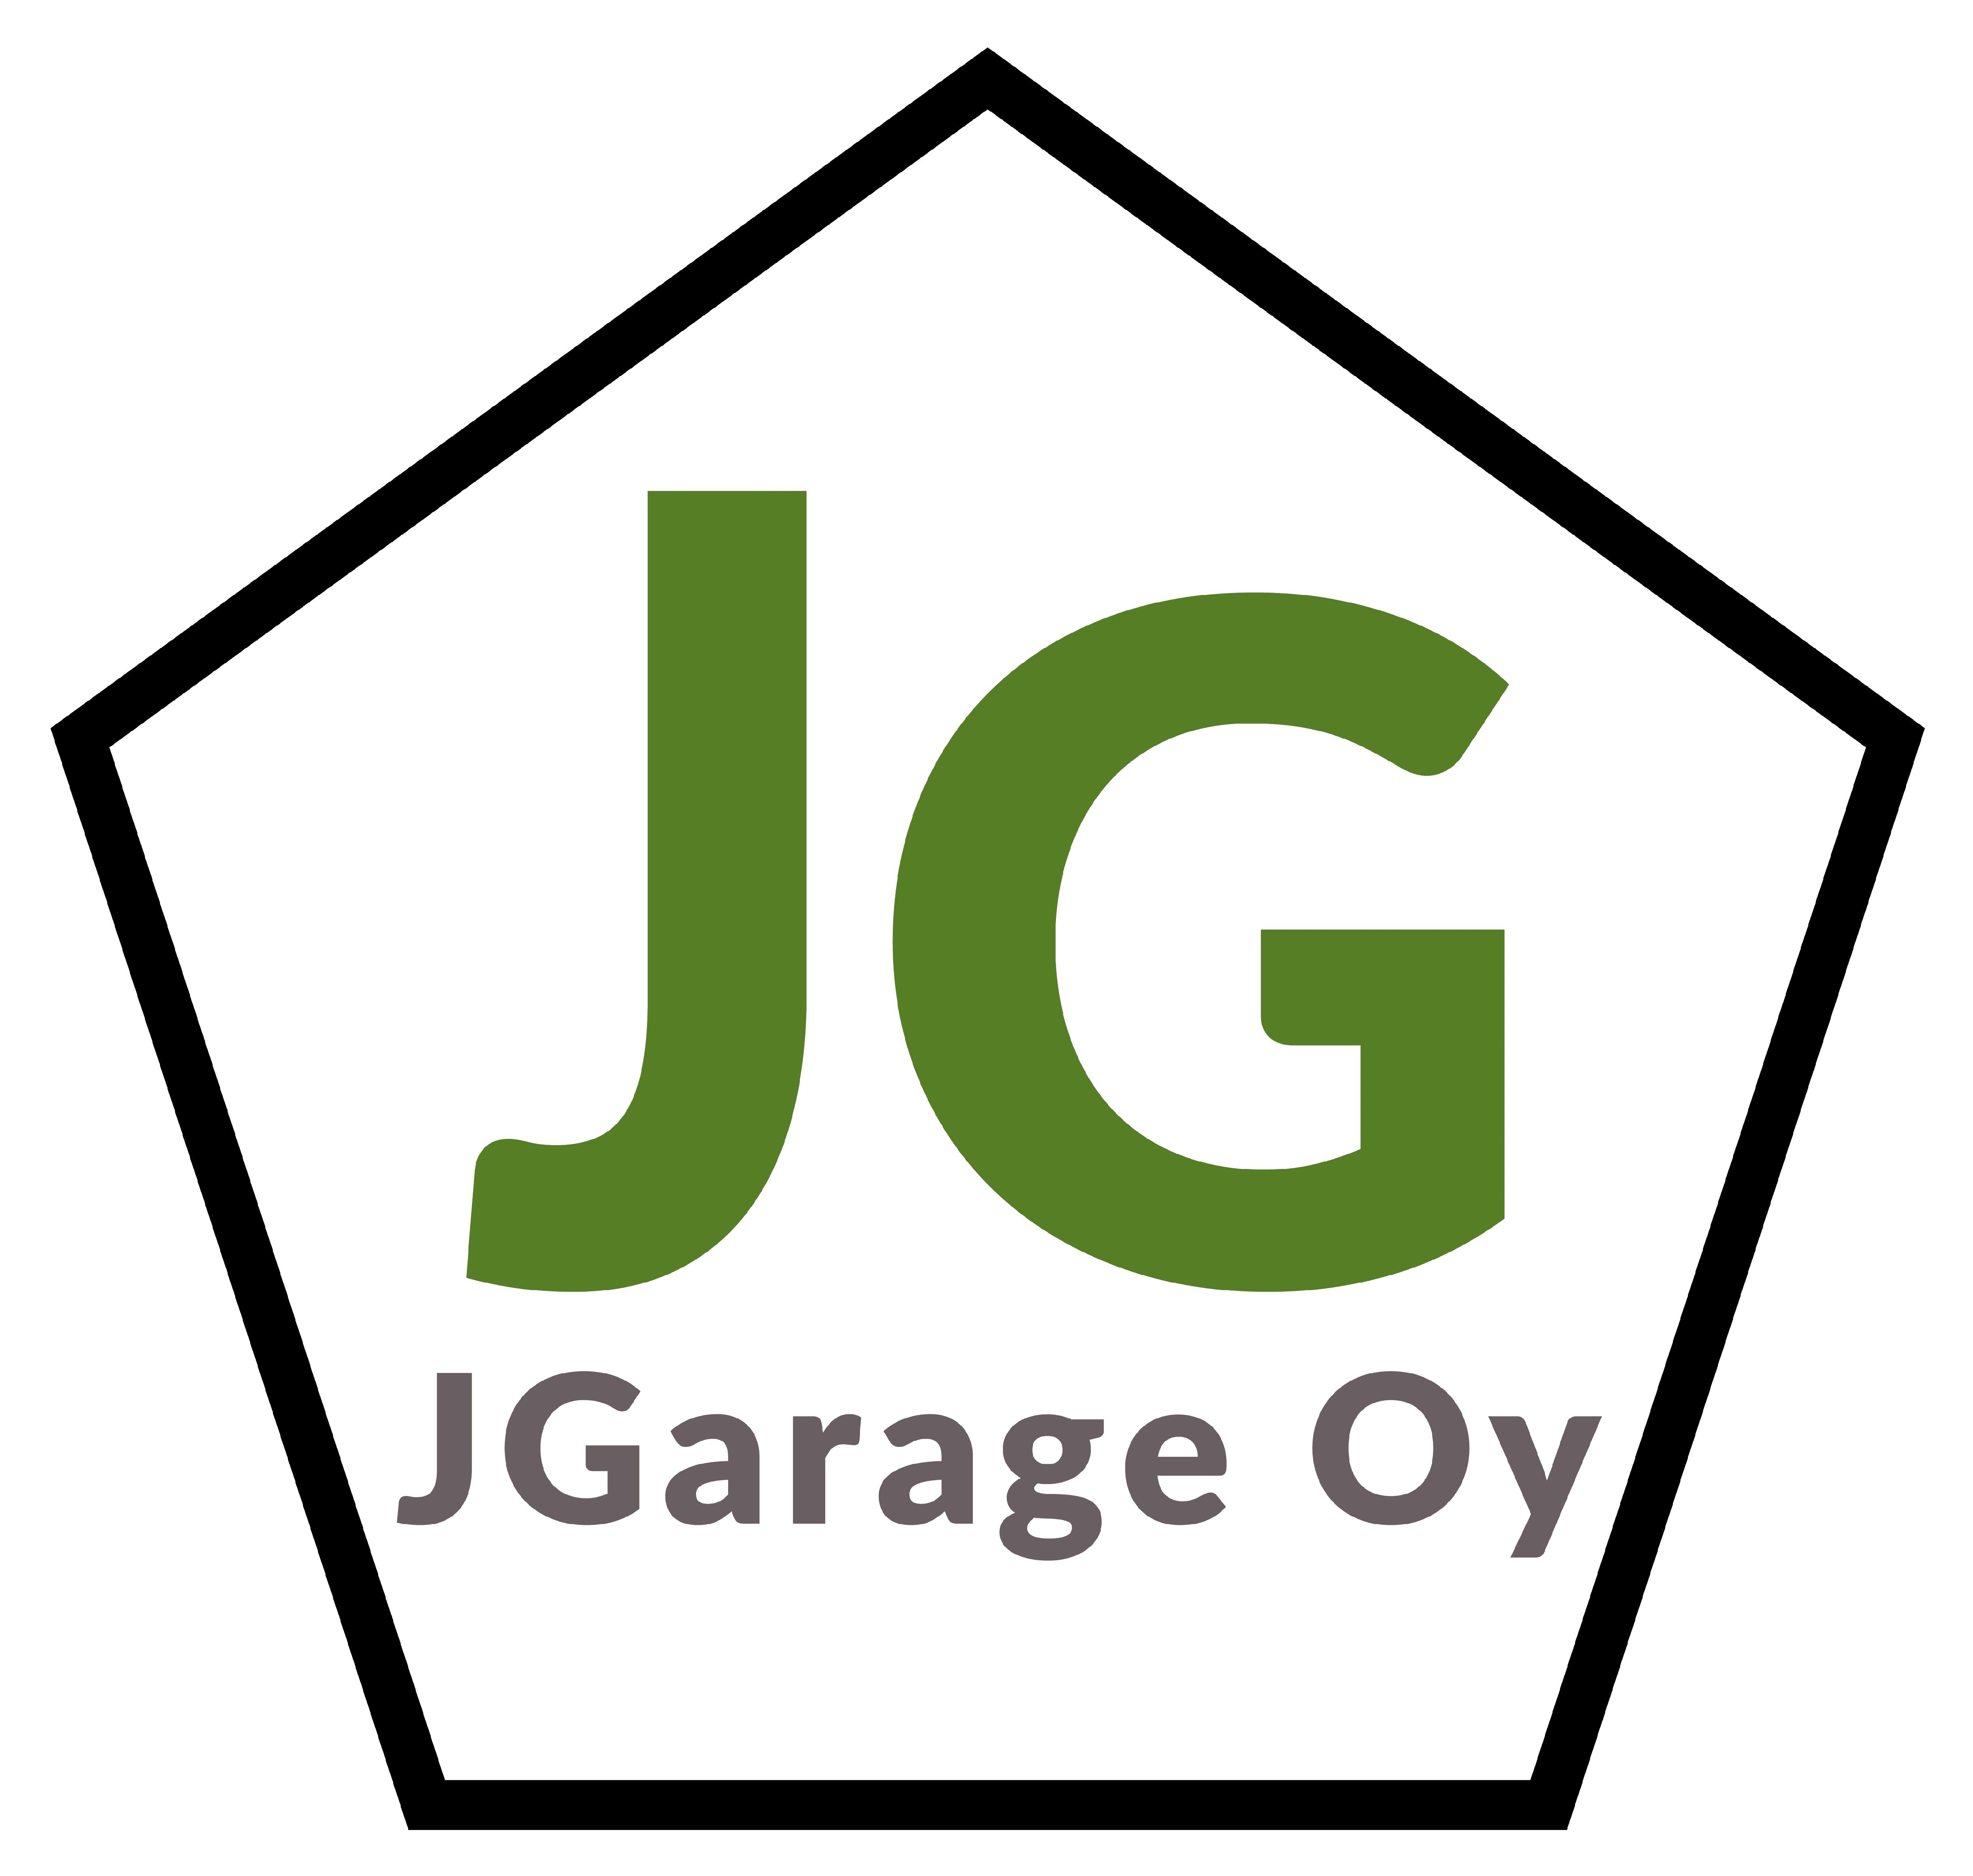 JGarage